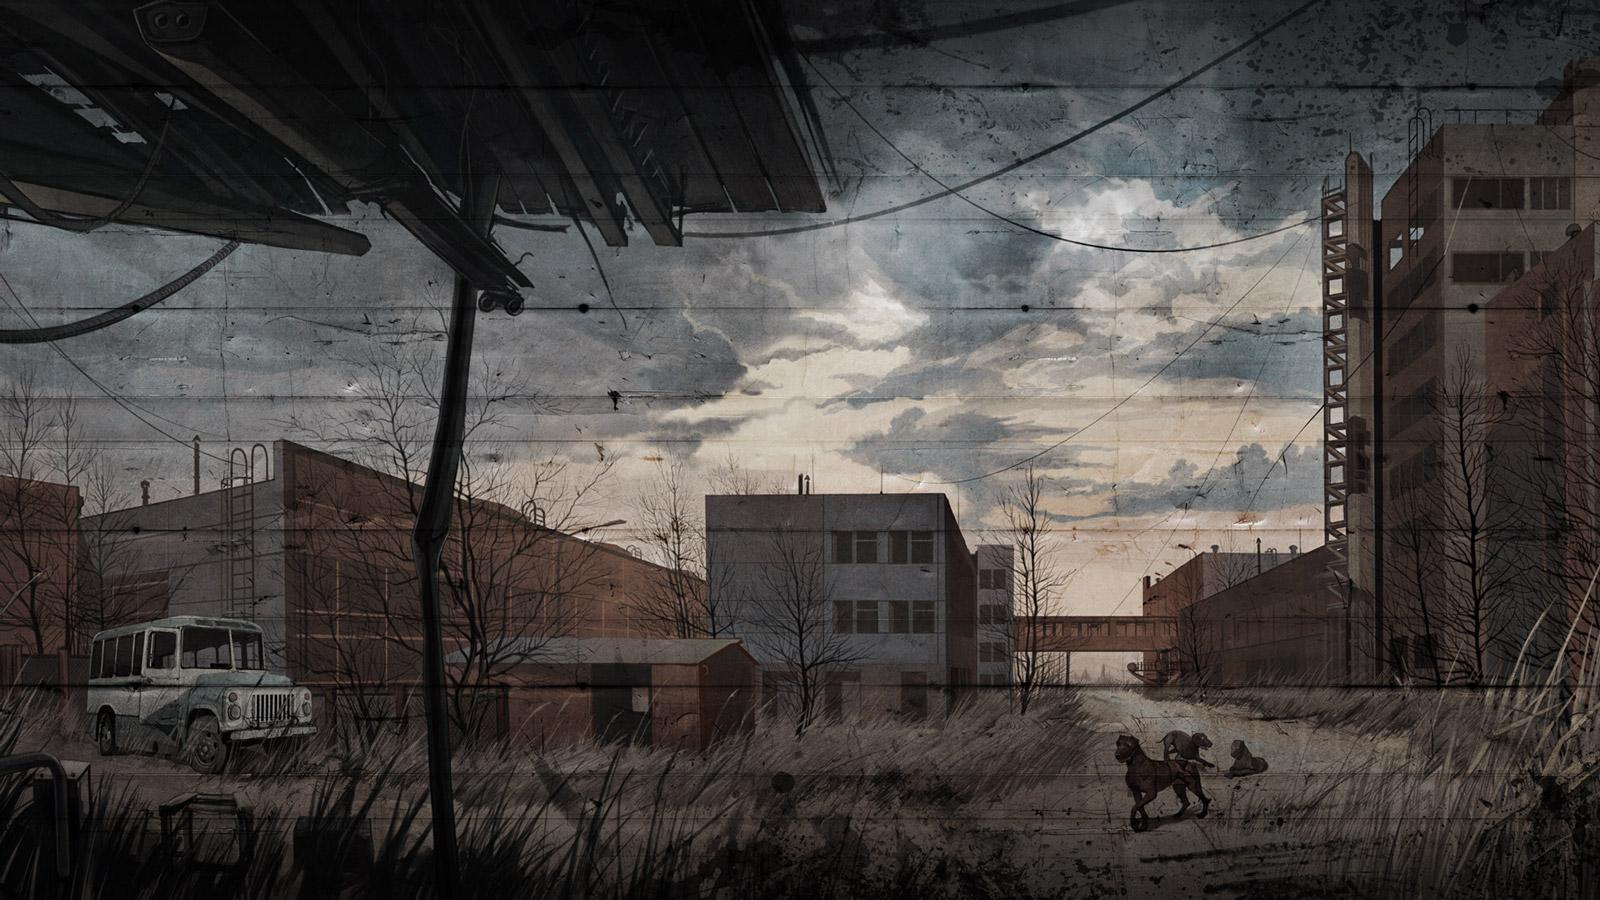 Free S.T.A.L.K.E.R.: Call of Pripyat Wallpaper in 1600x900